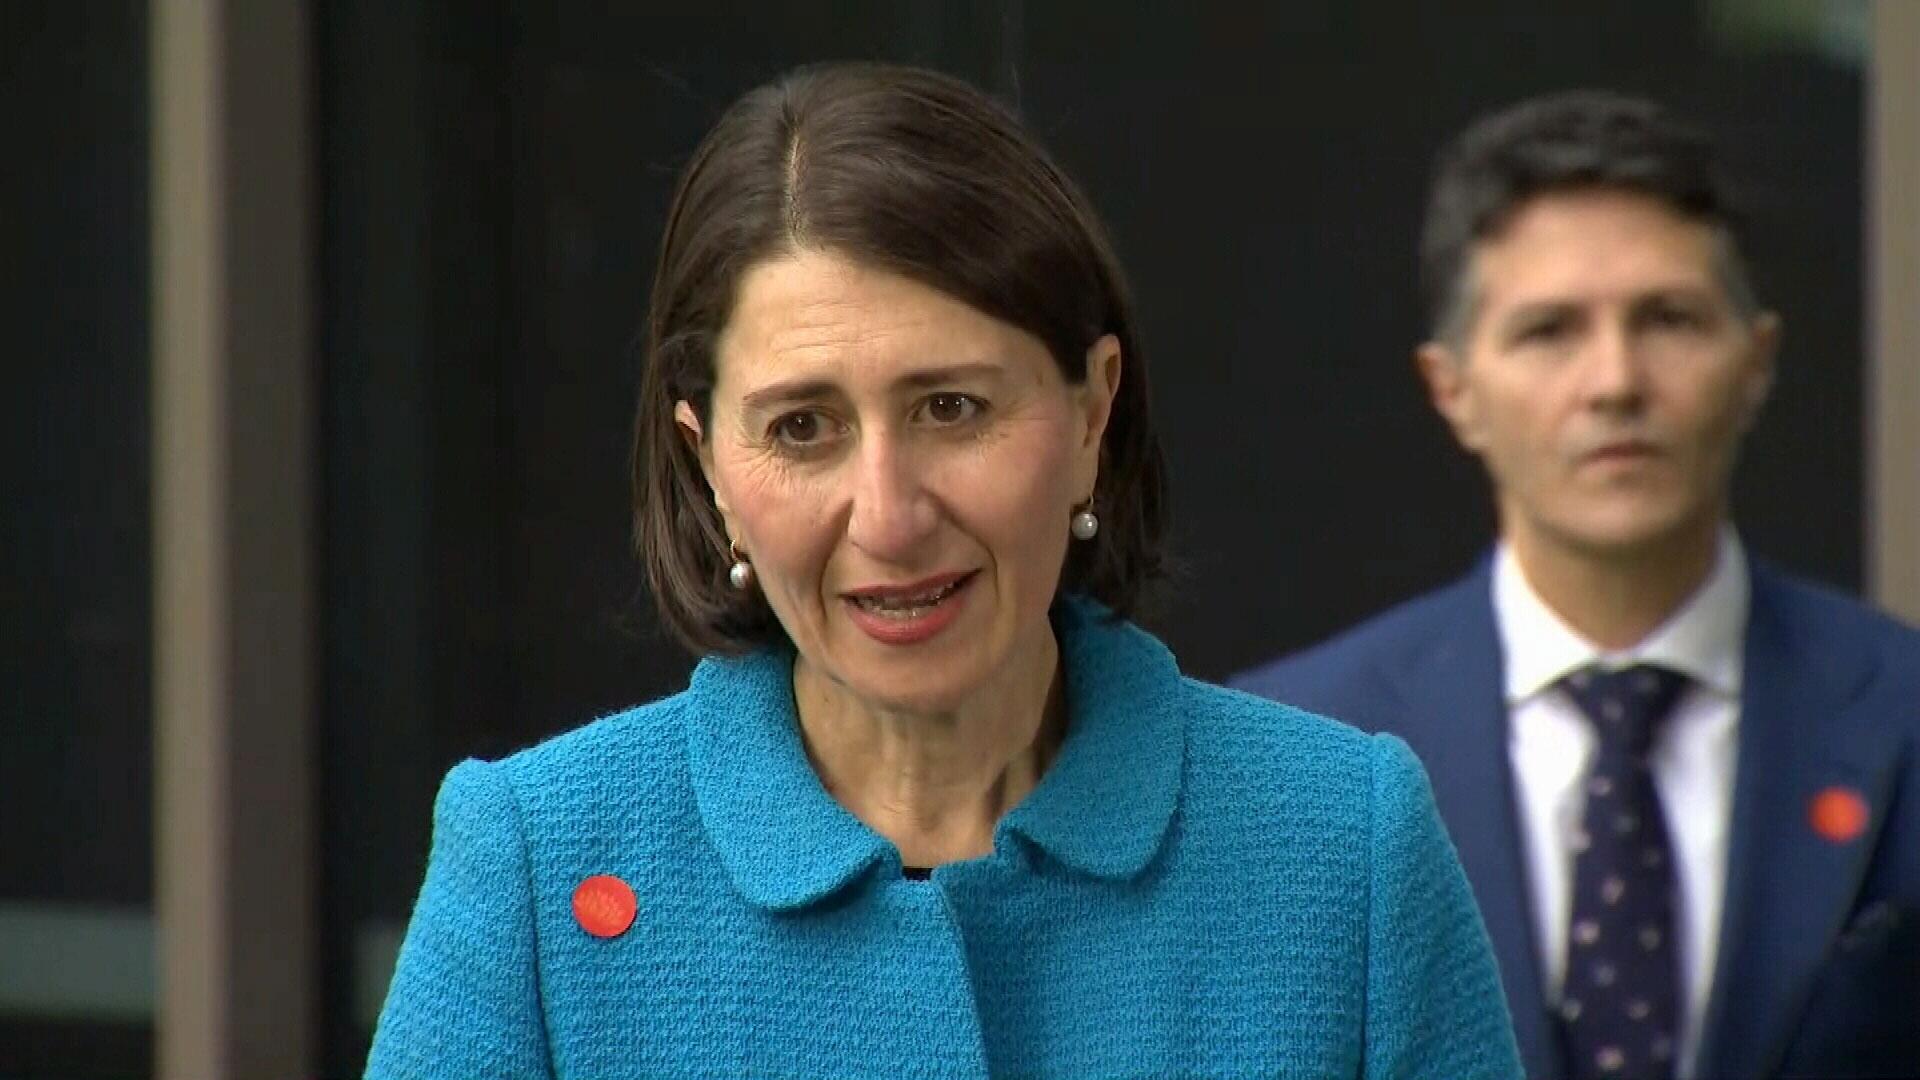 NSW premier Gladys Berejiklian speaking about the coronavirus situation on Thursday May 7, 2020.